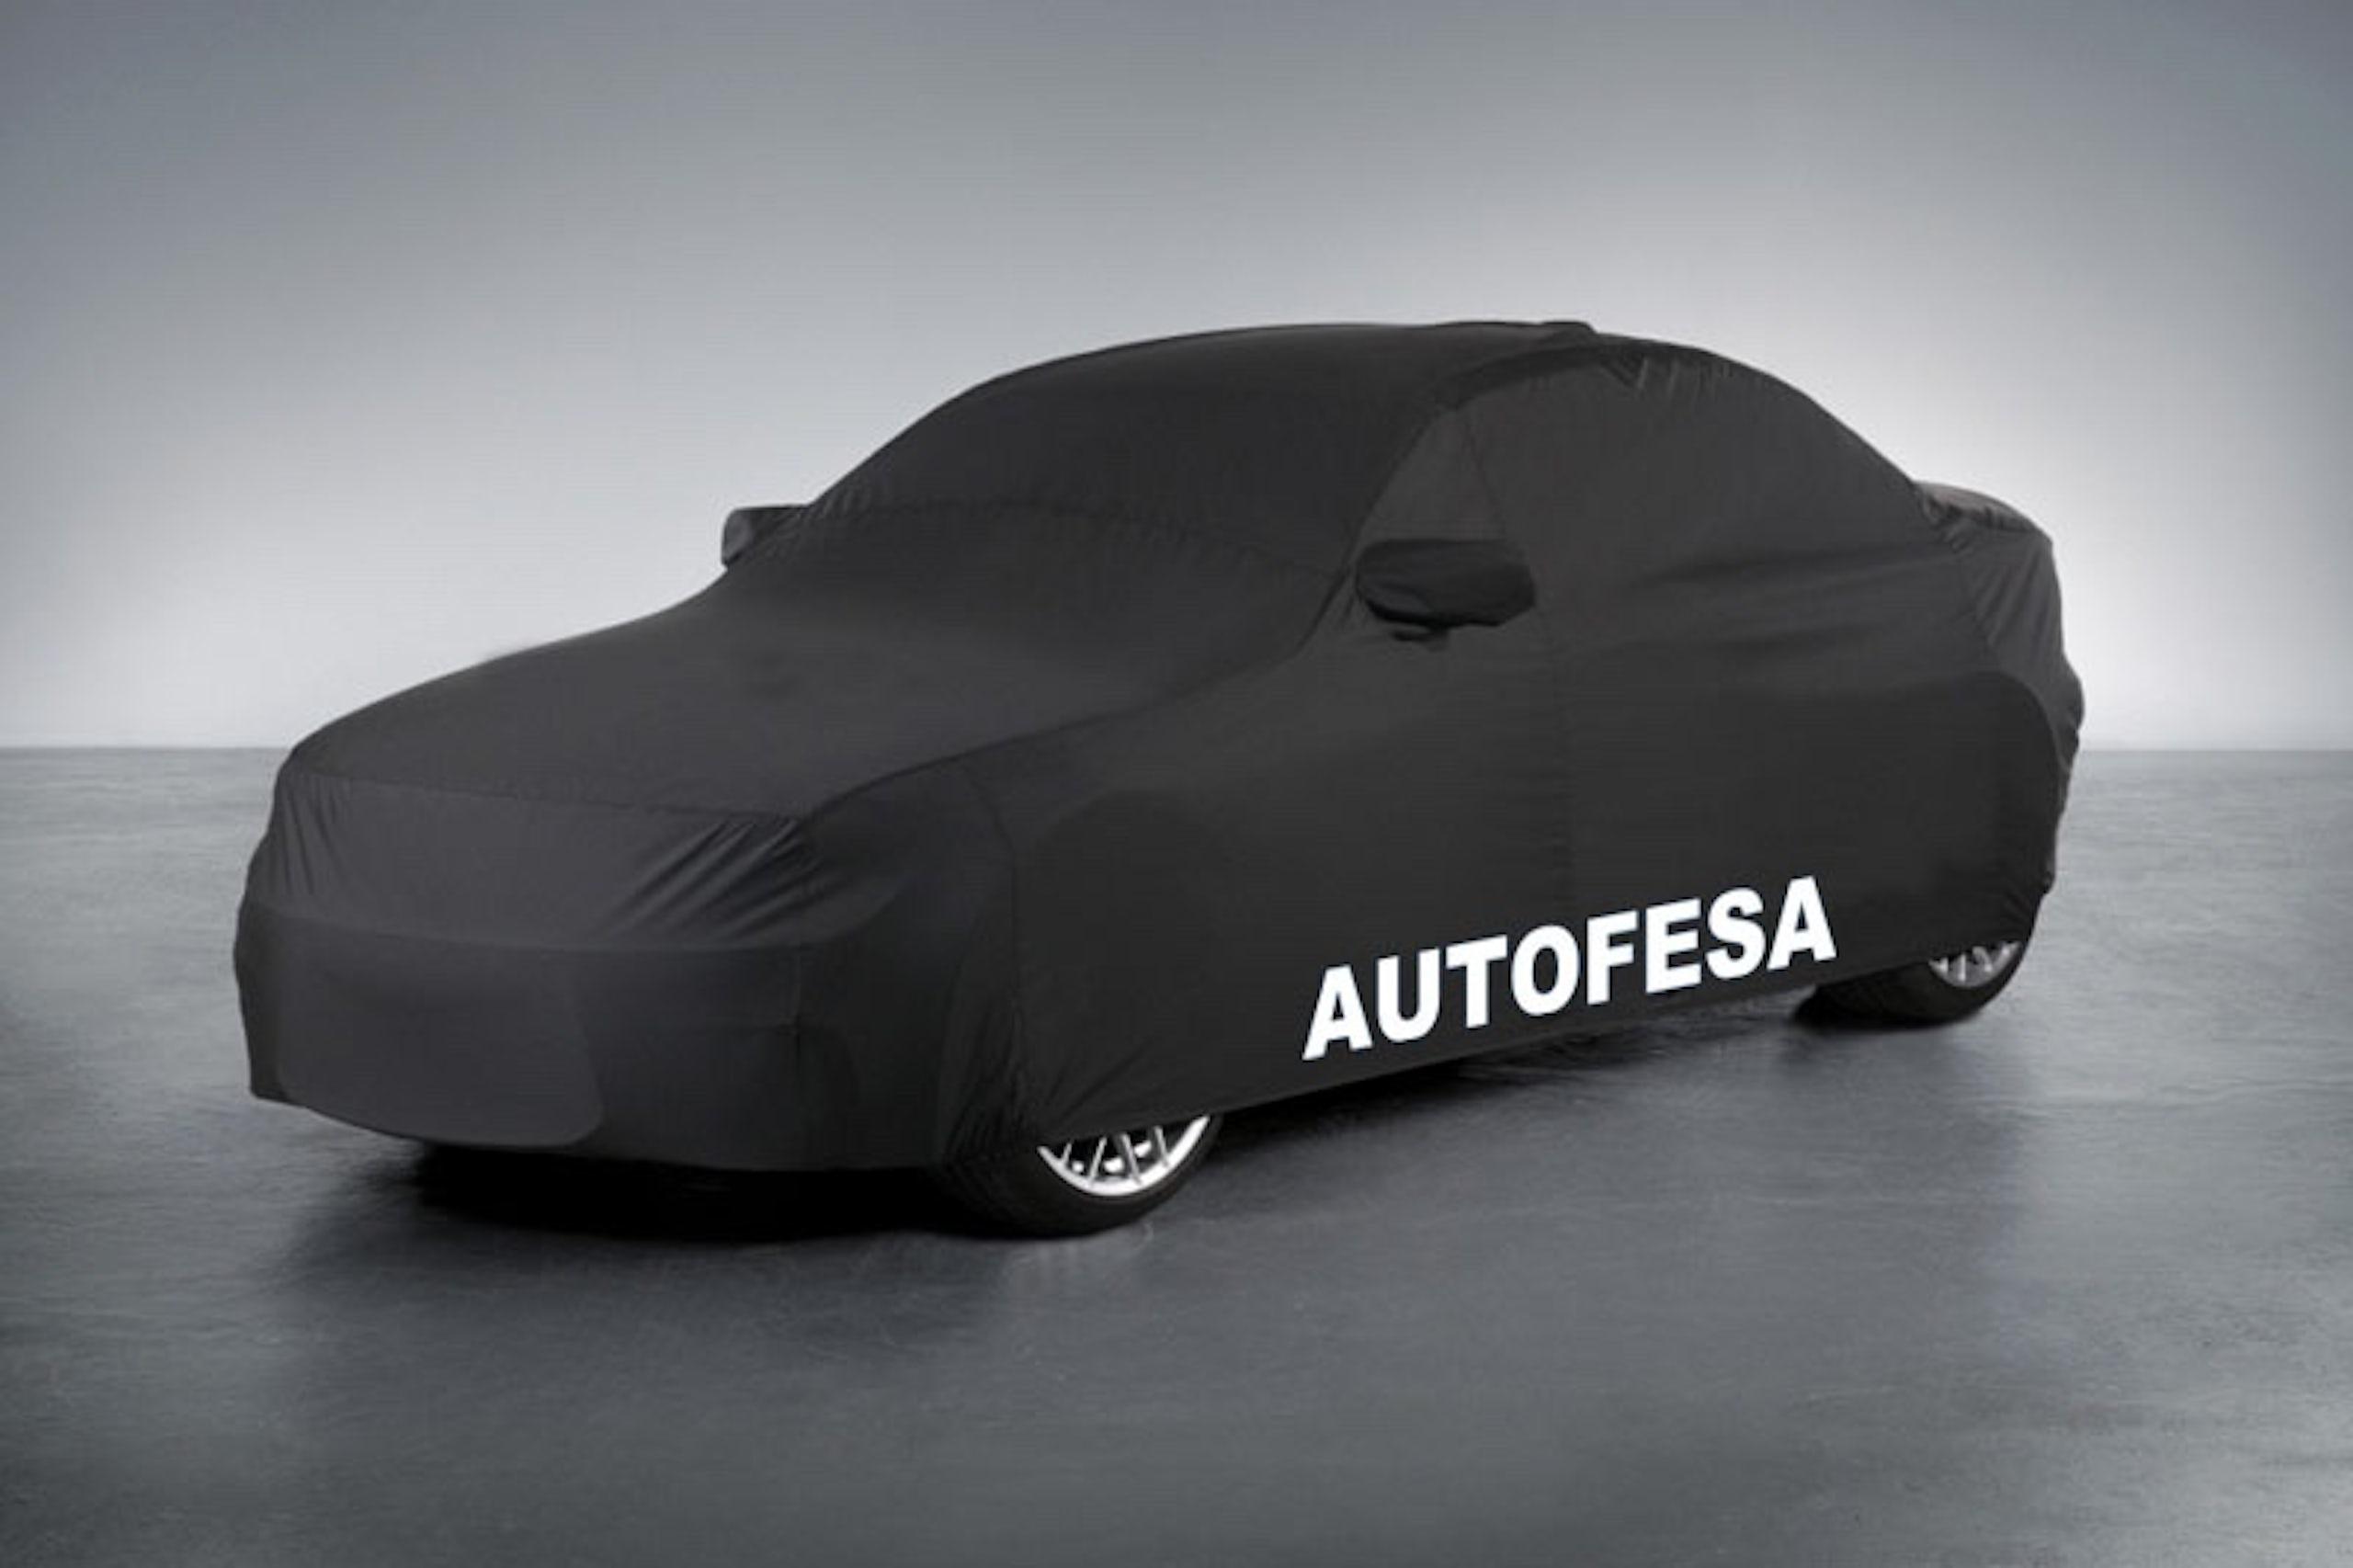 Audi A6 A6Avant COMPETITION ABT 3.0 TDI V6 T 326cv quattro 5p S tronic 4x4 Cpmpetition ABT S/S - Foto 29